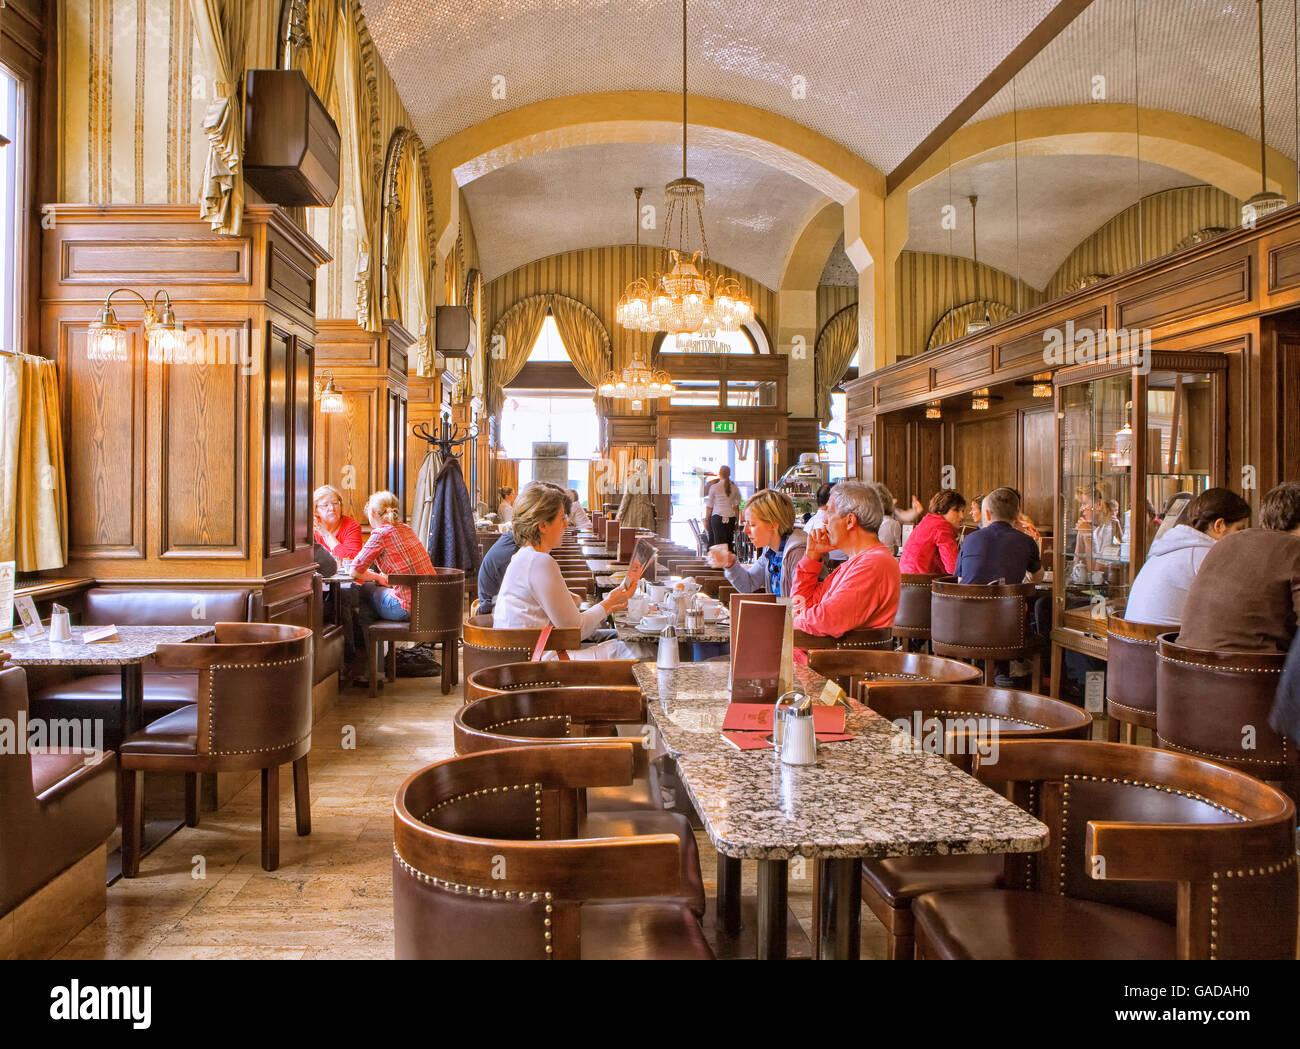 Cafe Vienna Stockfotos & Cafe Vienna Bilder - Alamy